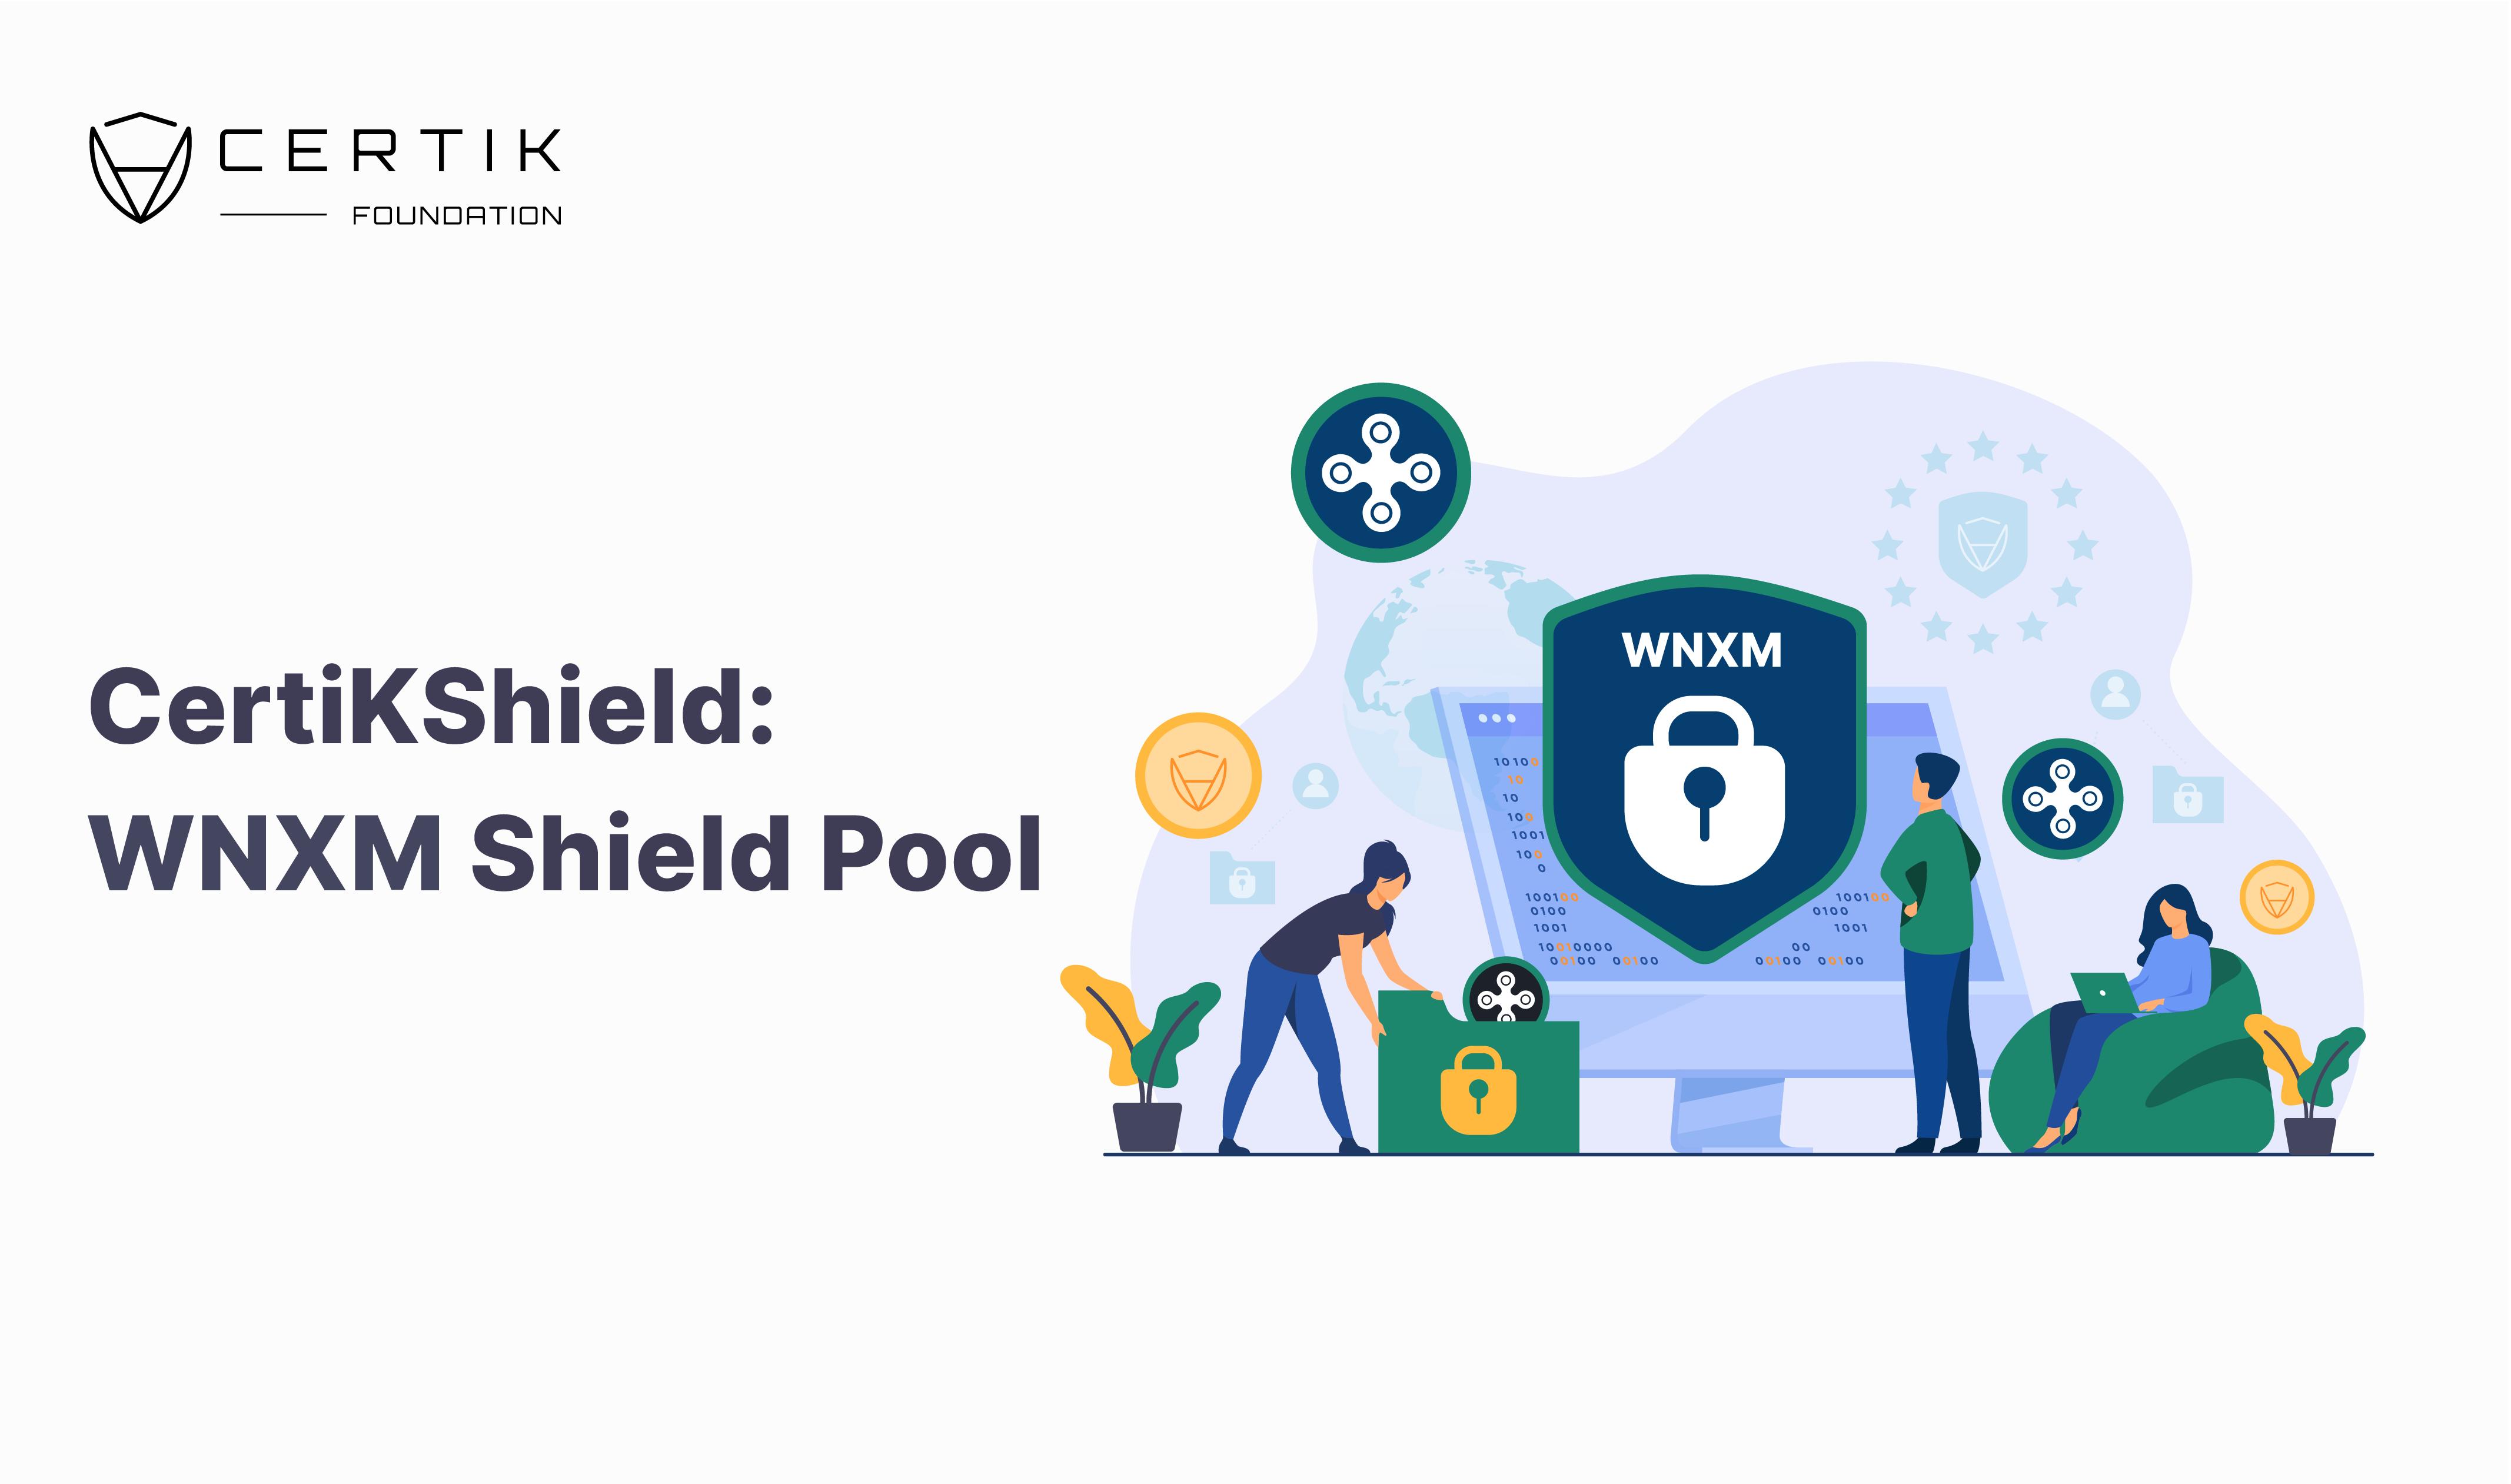 Introducing: WNXM Shield Pool